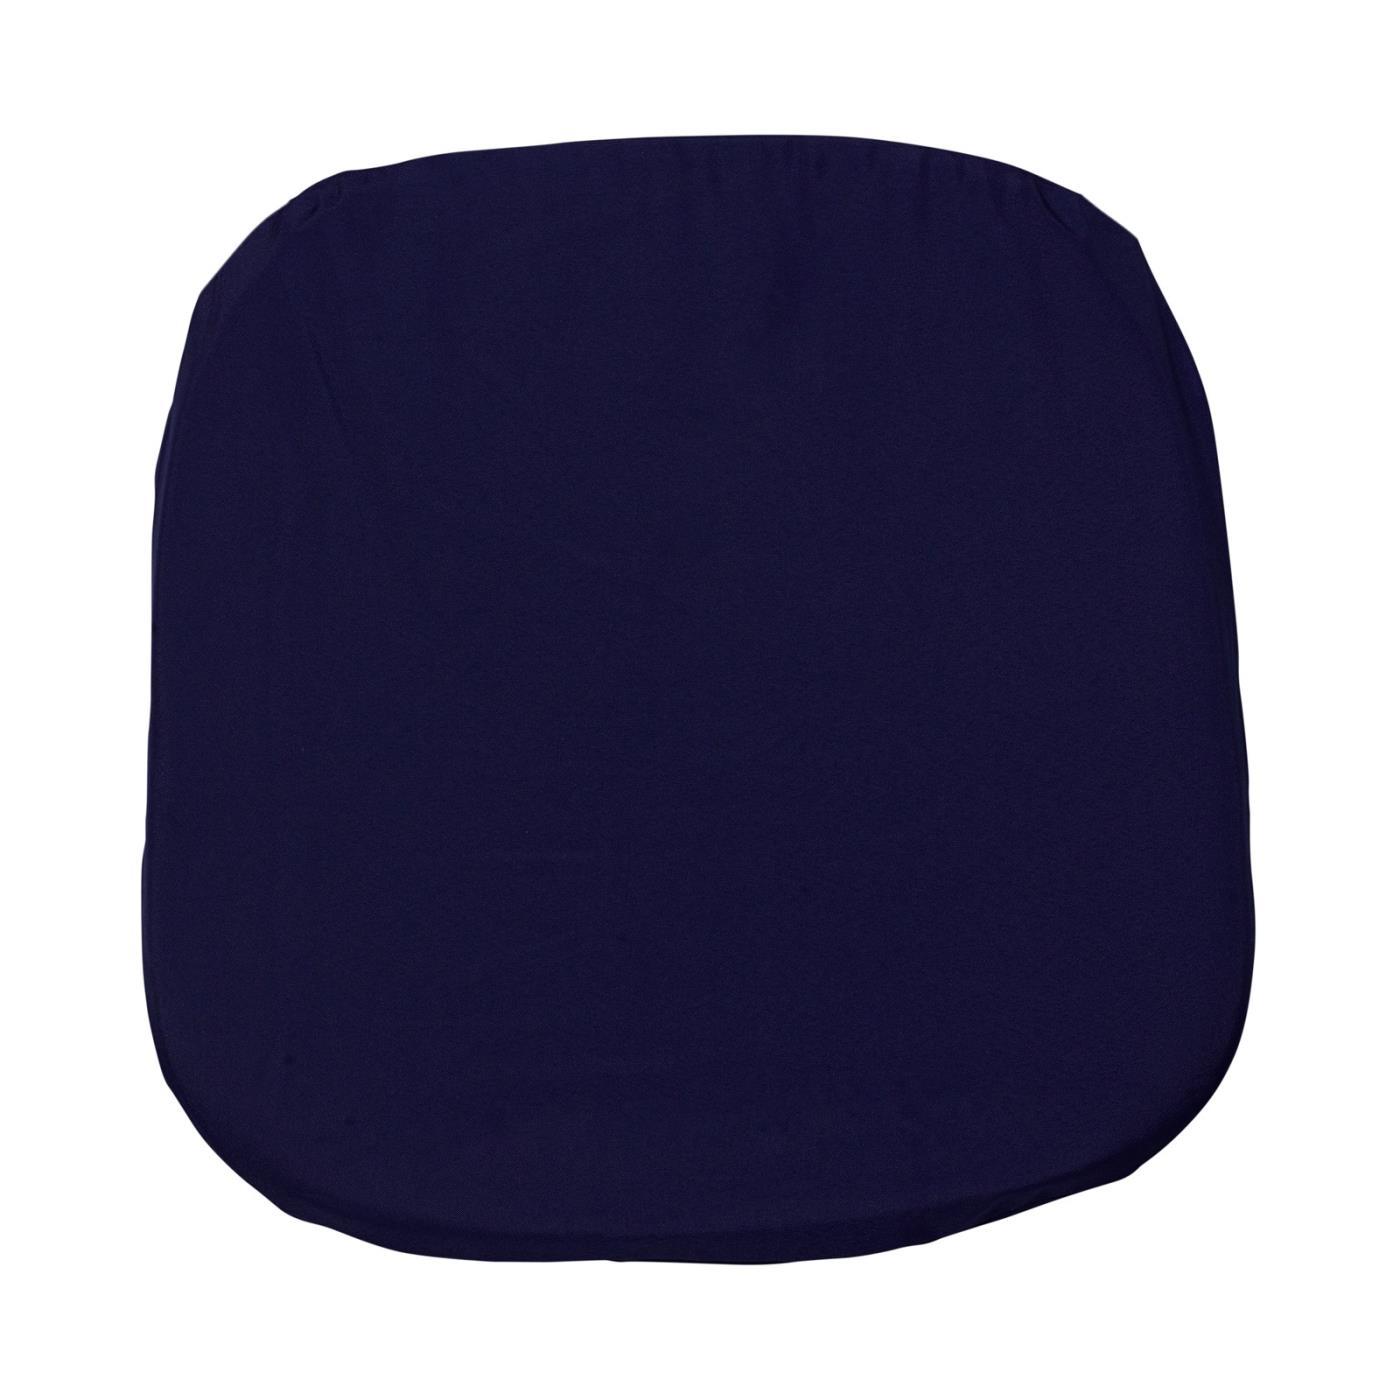 Poly Seat Cushion - Deep Royal